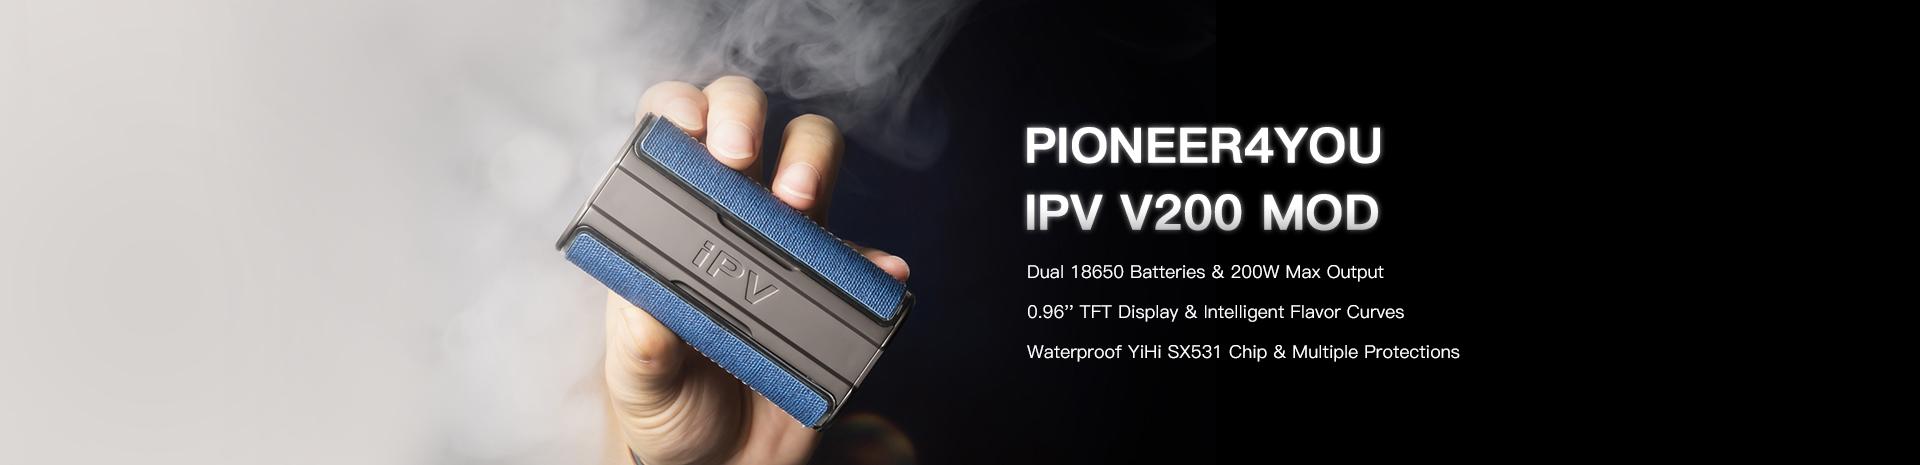 Pioneer4You iPV V200 Mod Banner